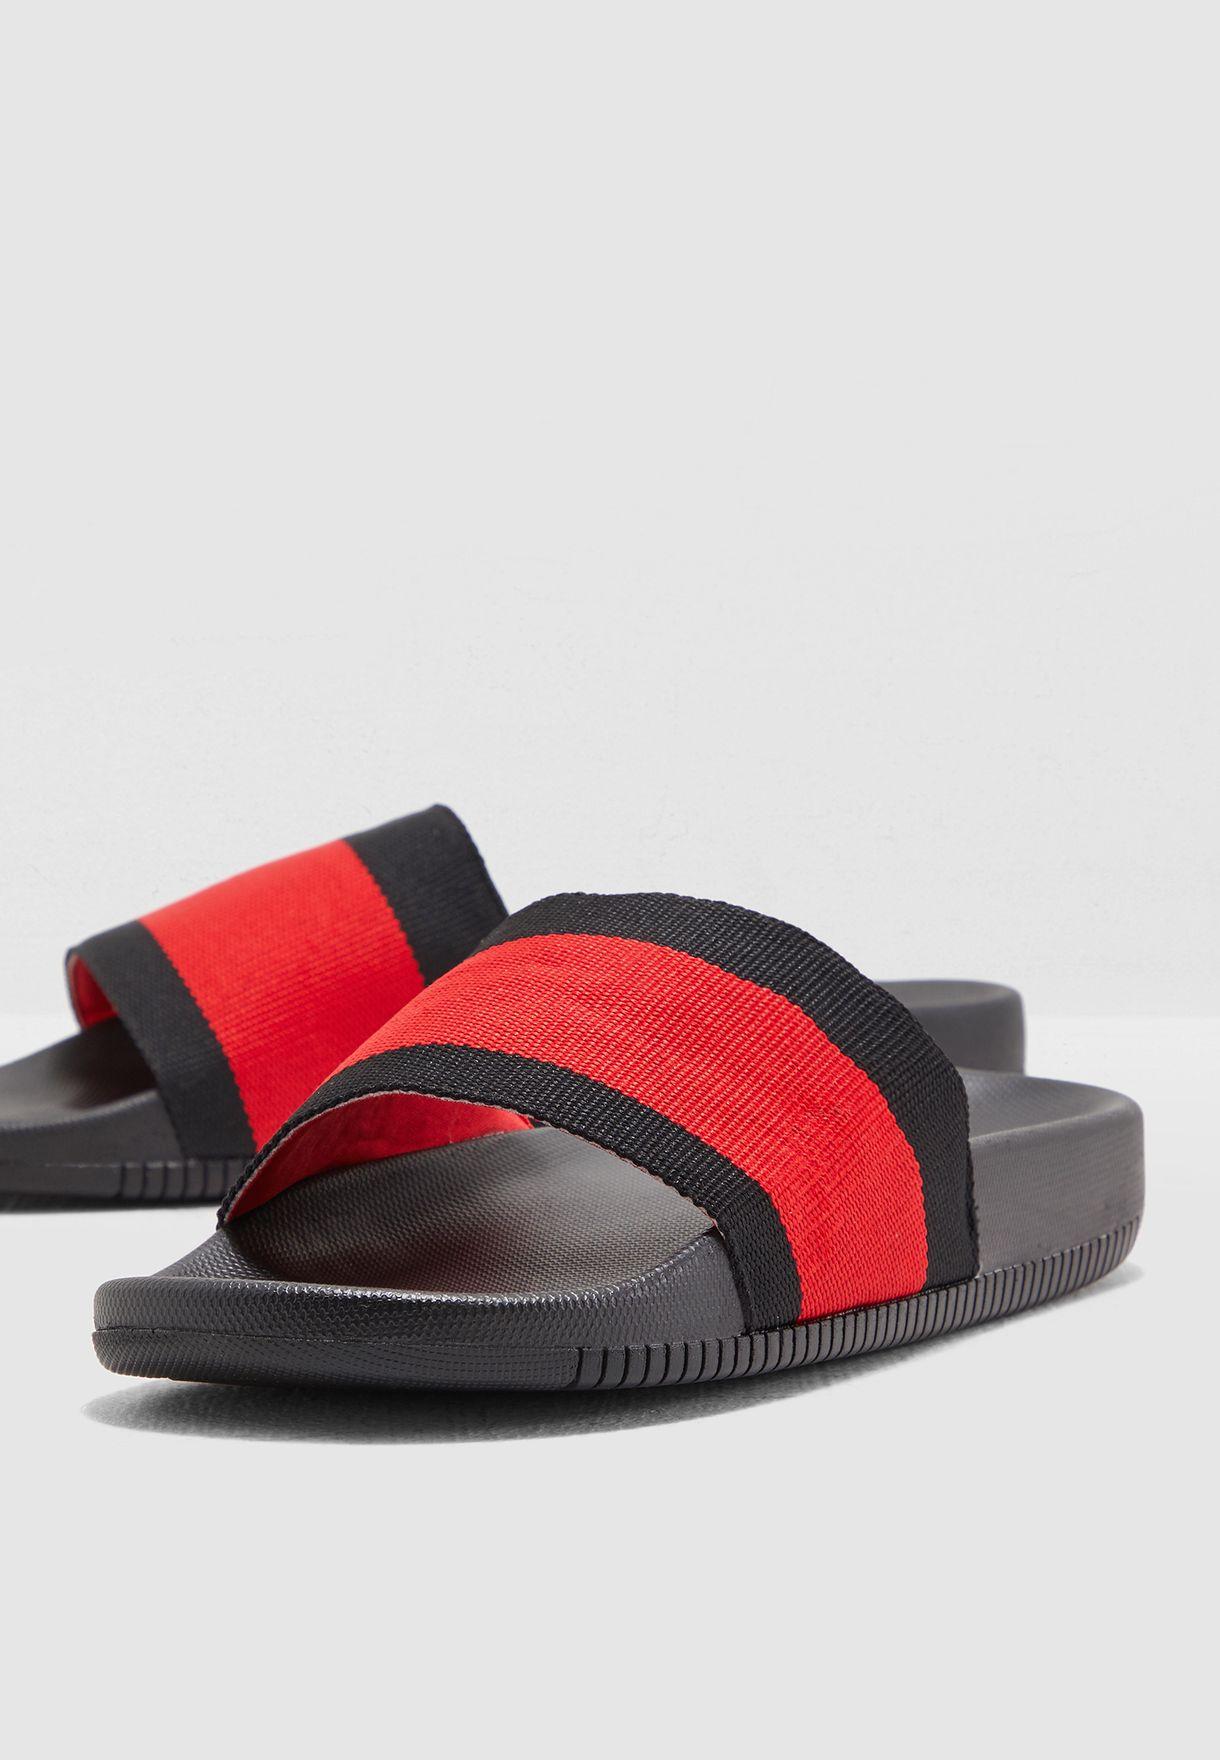 04ebbf92f38 Shop Aldo multicolor Ulzia Slides ULZIA96 for Men in UAE - 17704SH93NCP